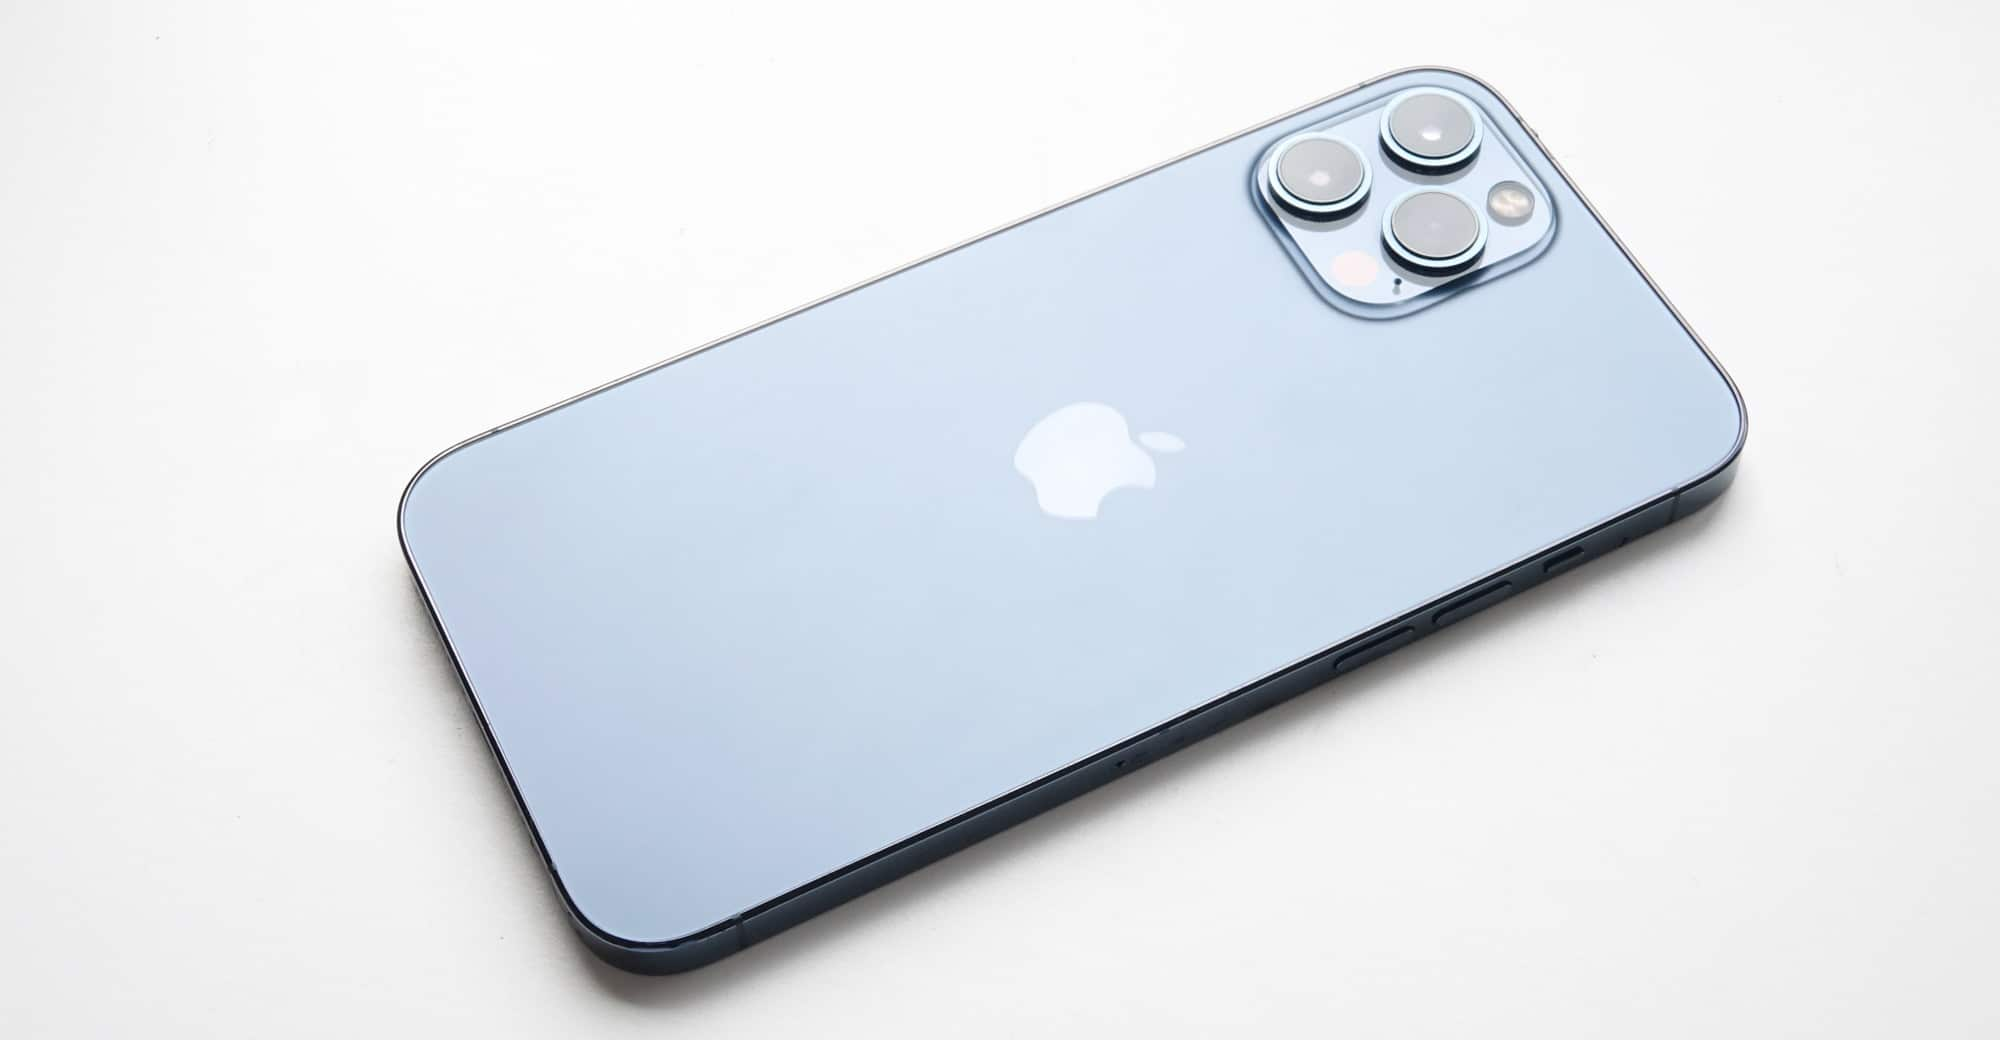 Apple iPhone 12 Pro Max cameras